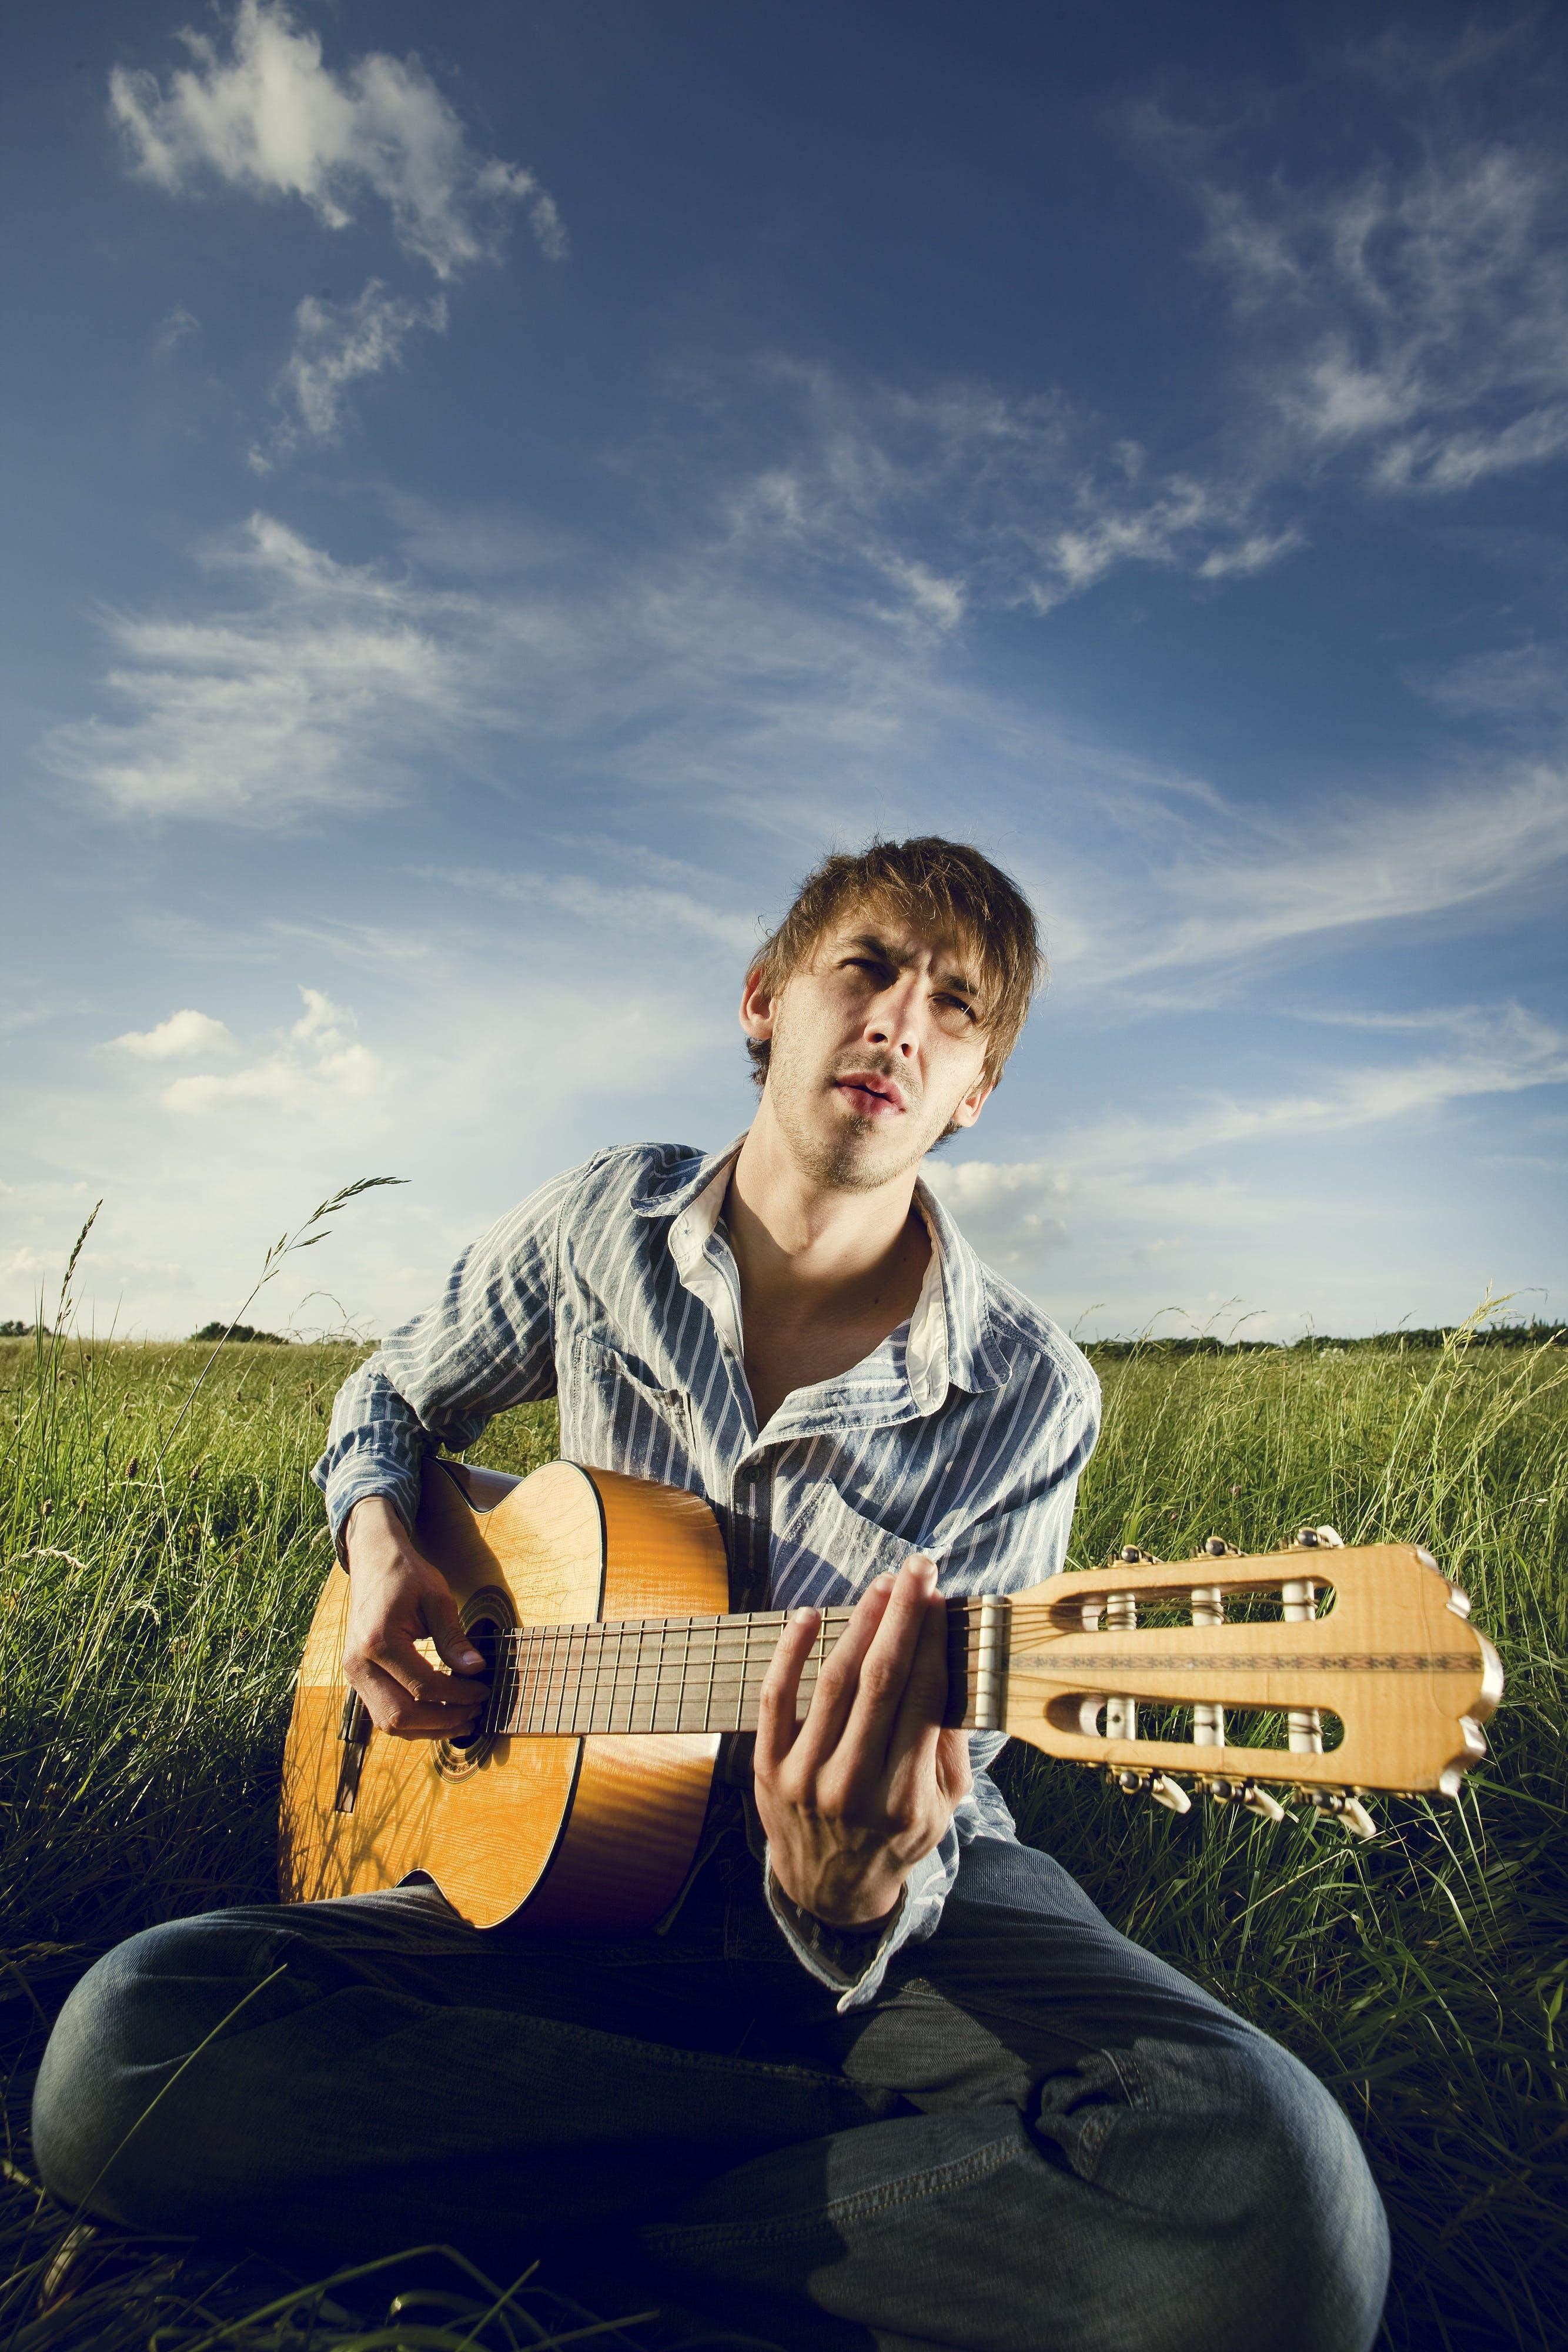 Man Playing Classical Guitar Outdoors